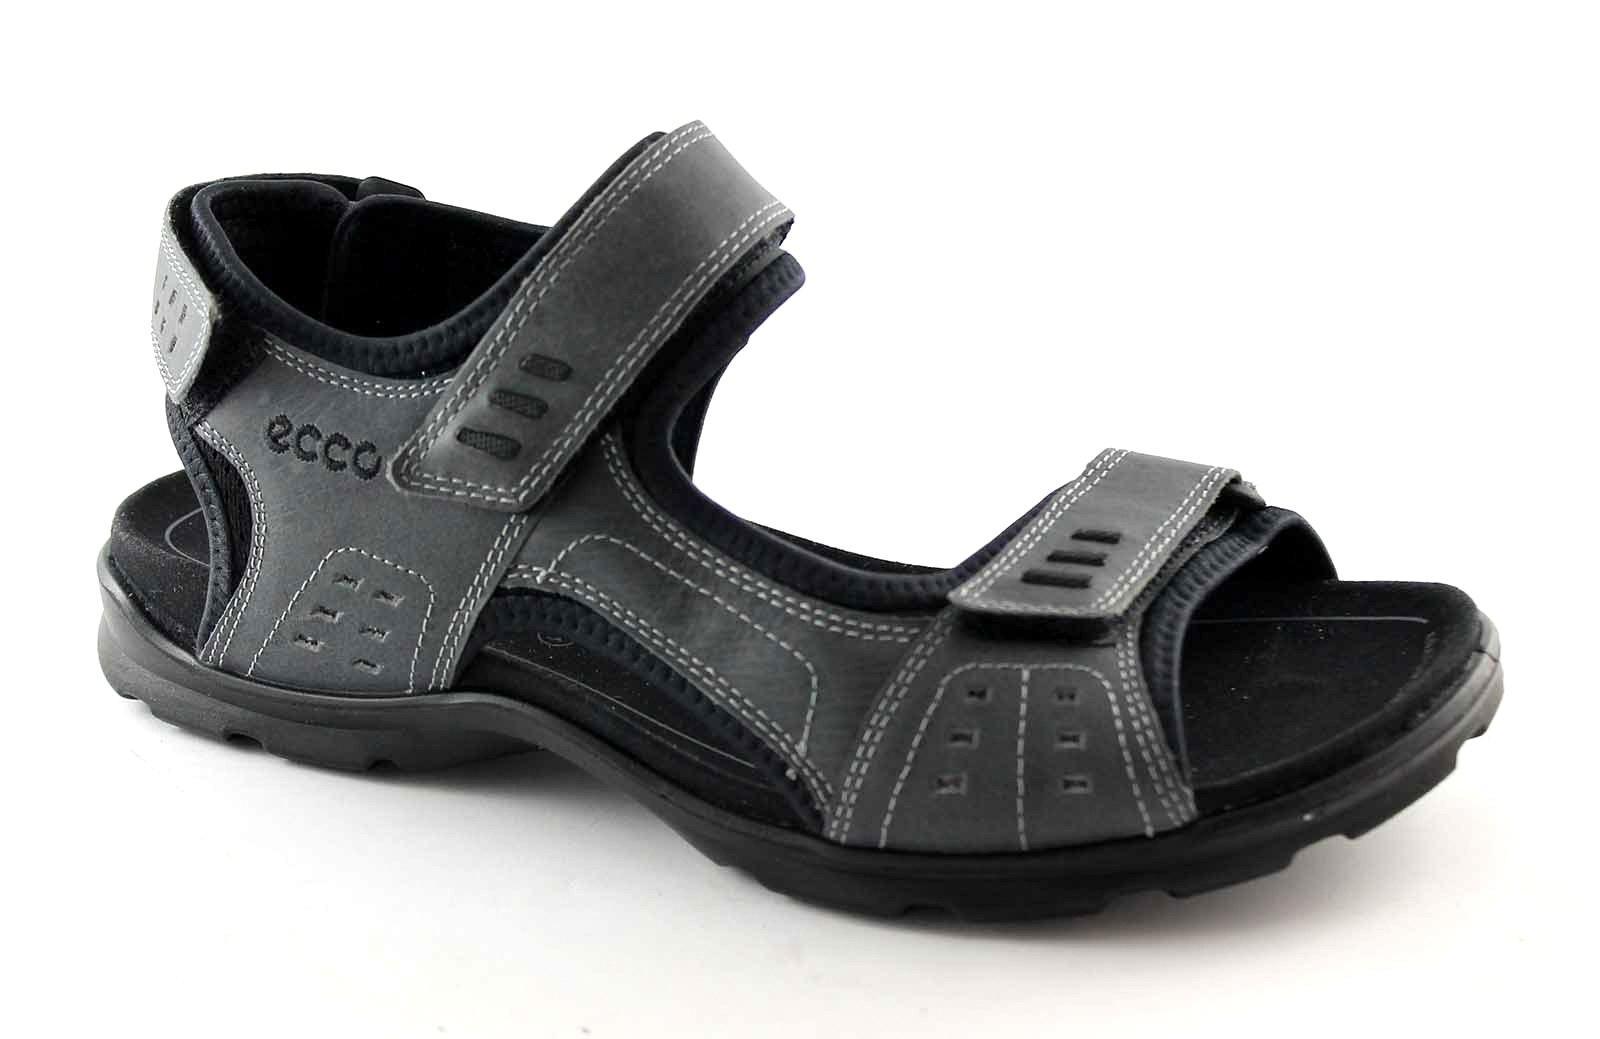 ECCO 834114 UTAH grigio sandalo uomo fasce strappi pelle